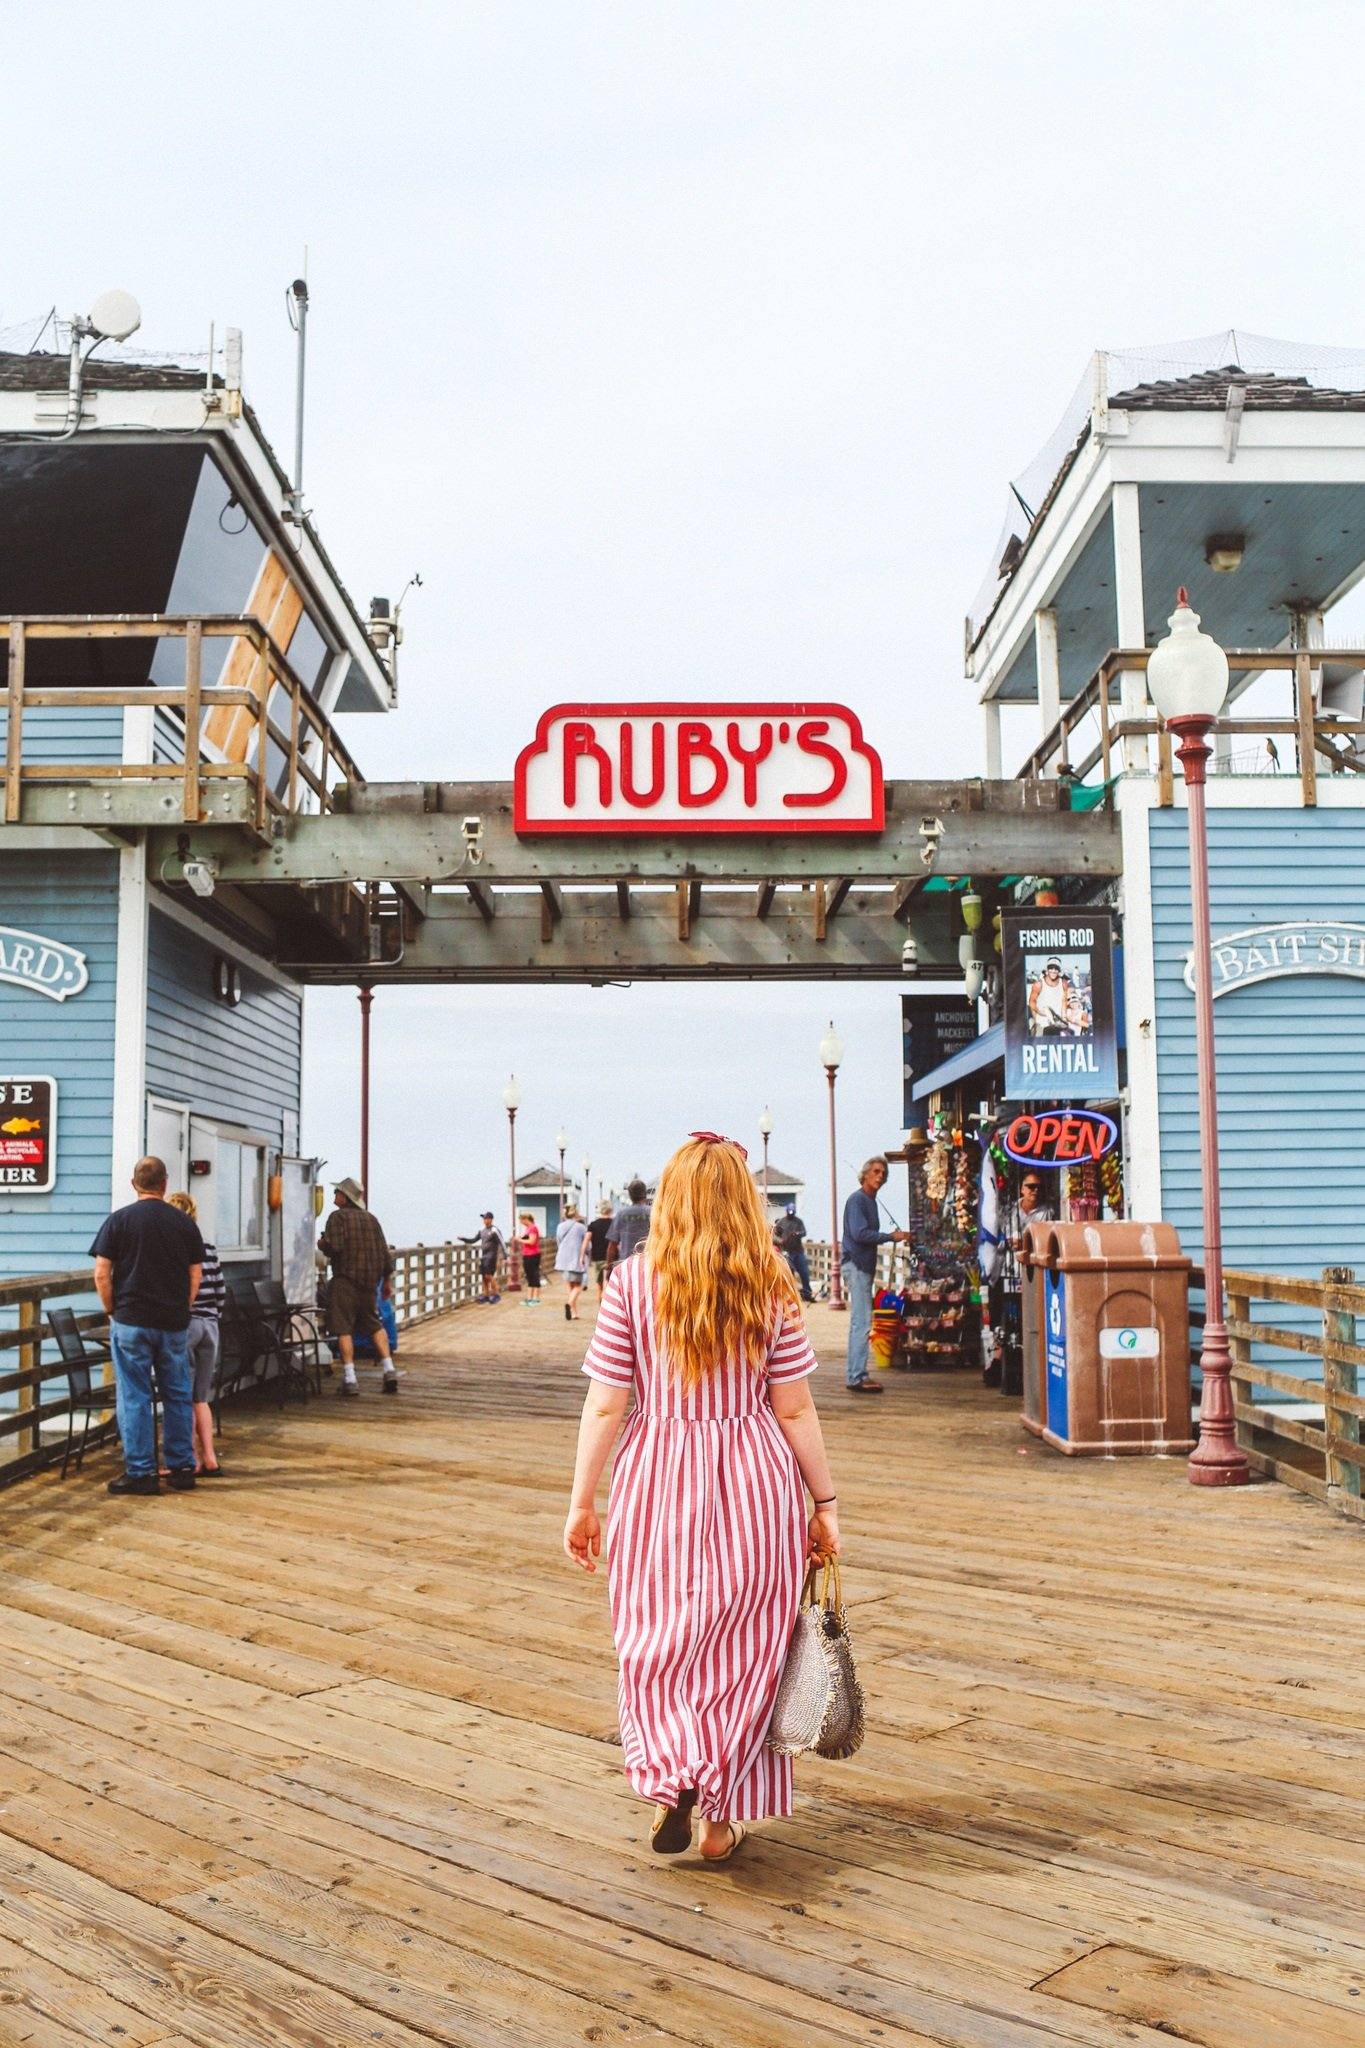 Ruby's Steakhouse on the pier in Oceanside, Ca